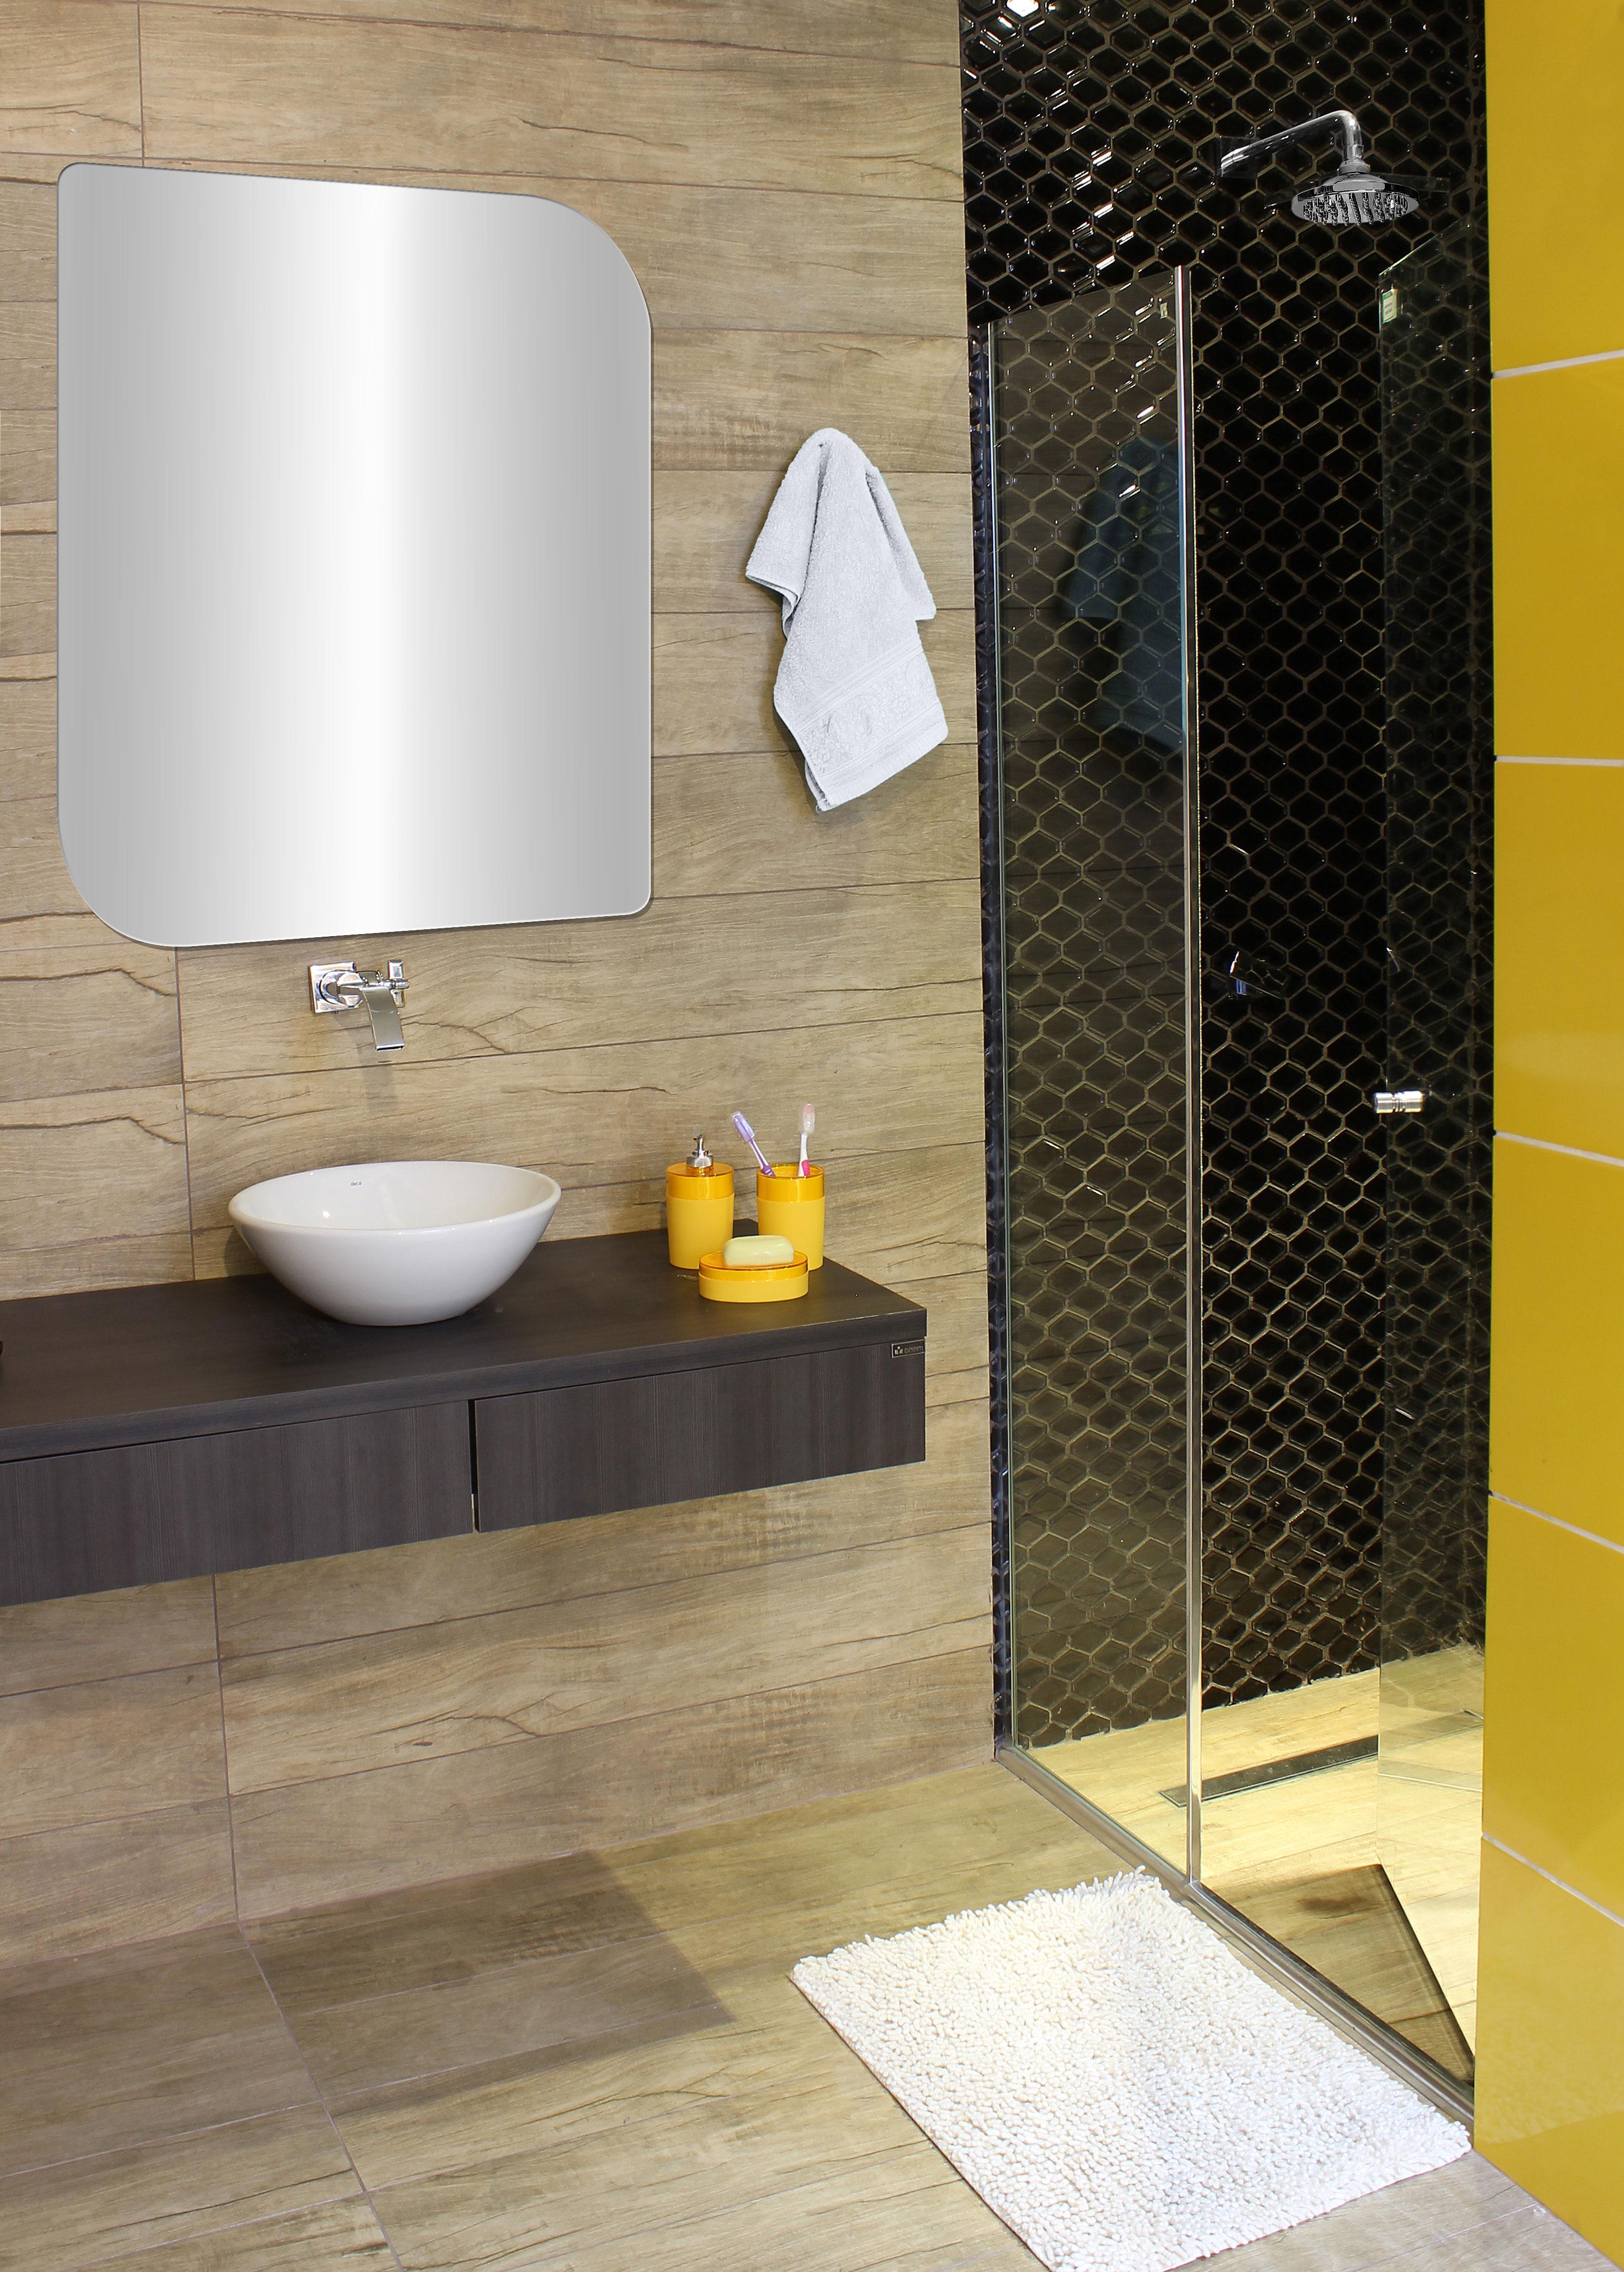 Banheiro pequeno e elegante leroy merlin for Lavabo pequeno leroy merlin